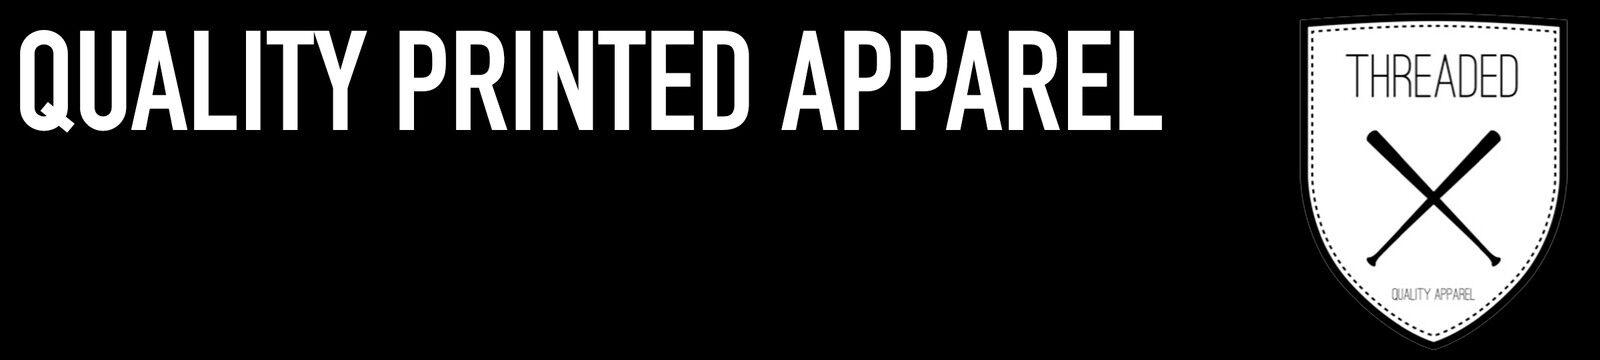 Threaded Apparel